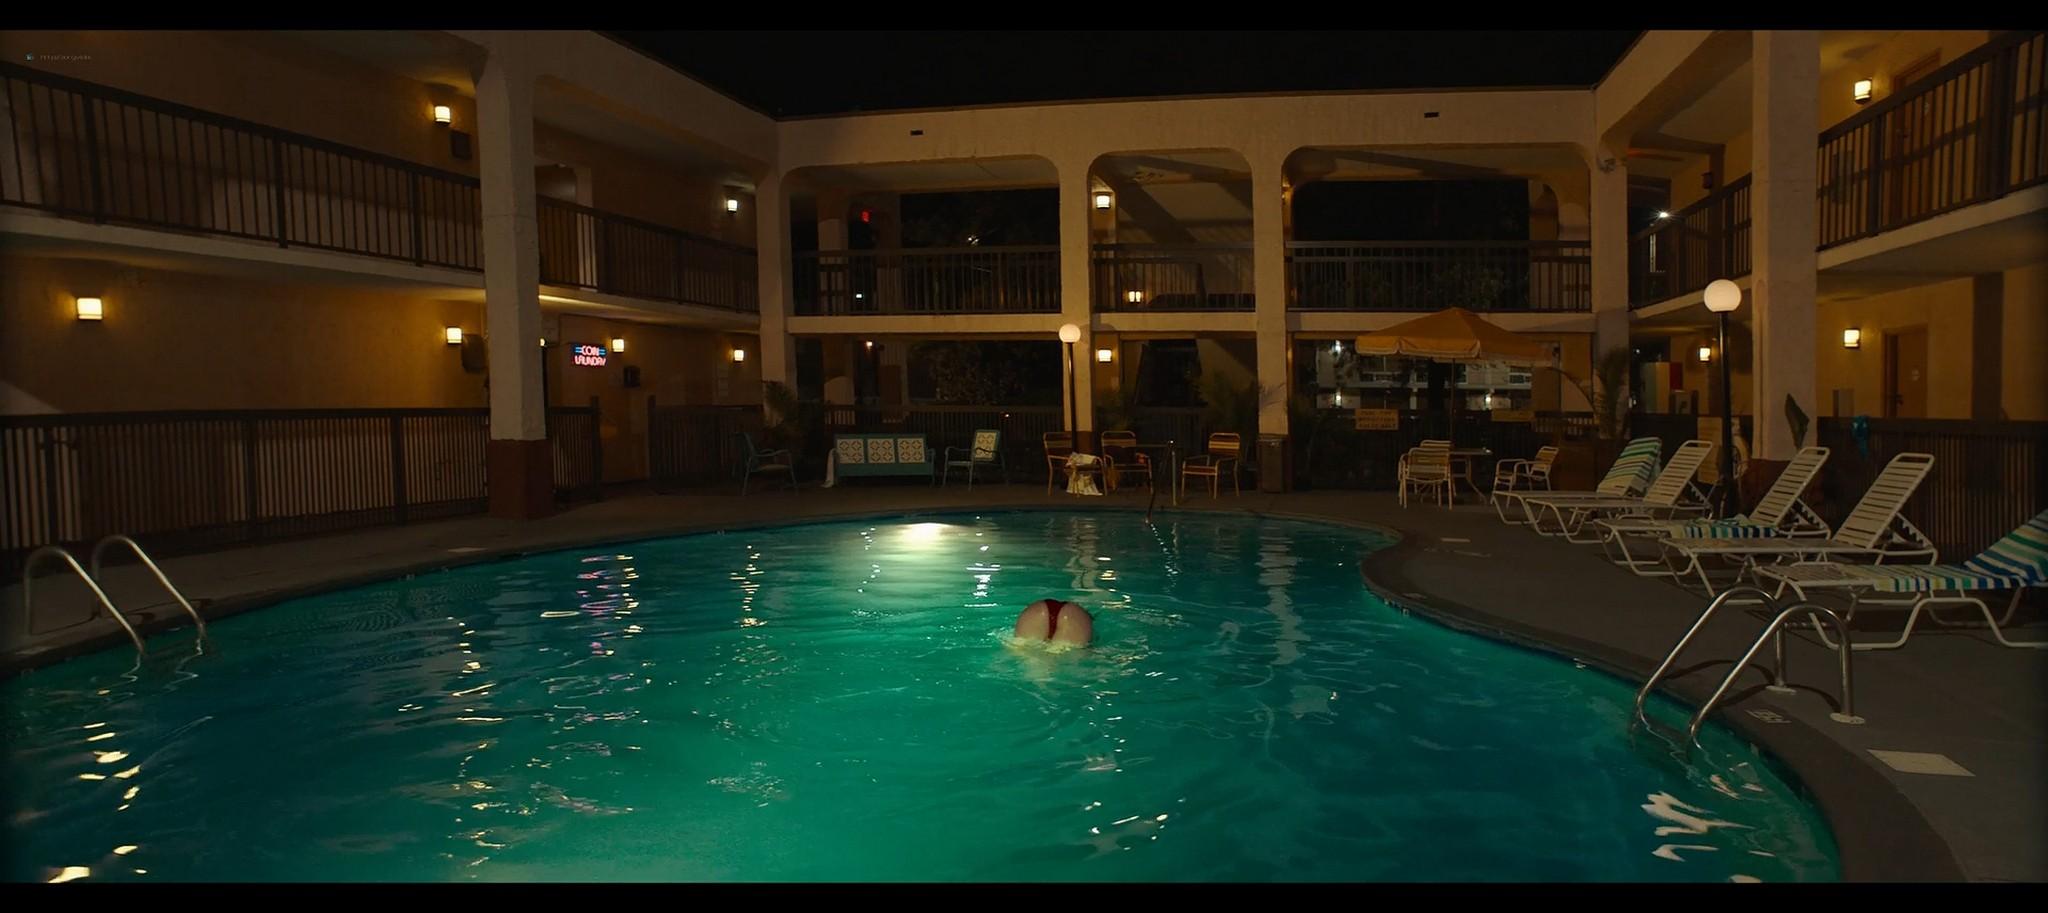 Minka Kelly hot in a swimsuit AnnaSophia Robb sexy Lansky 2021 1080p Web 4